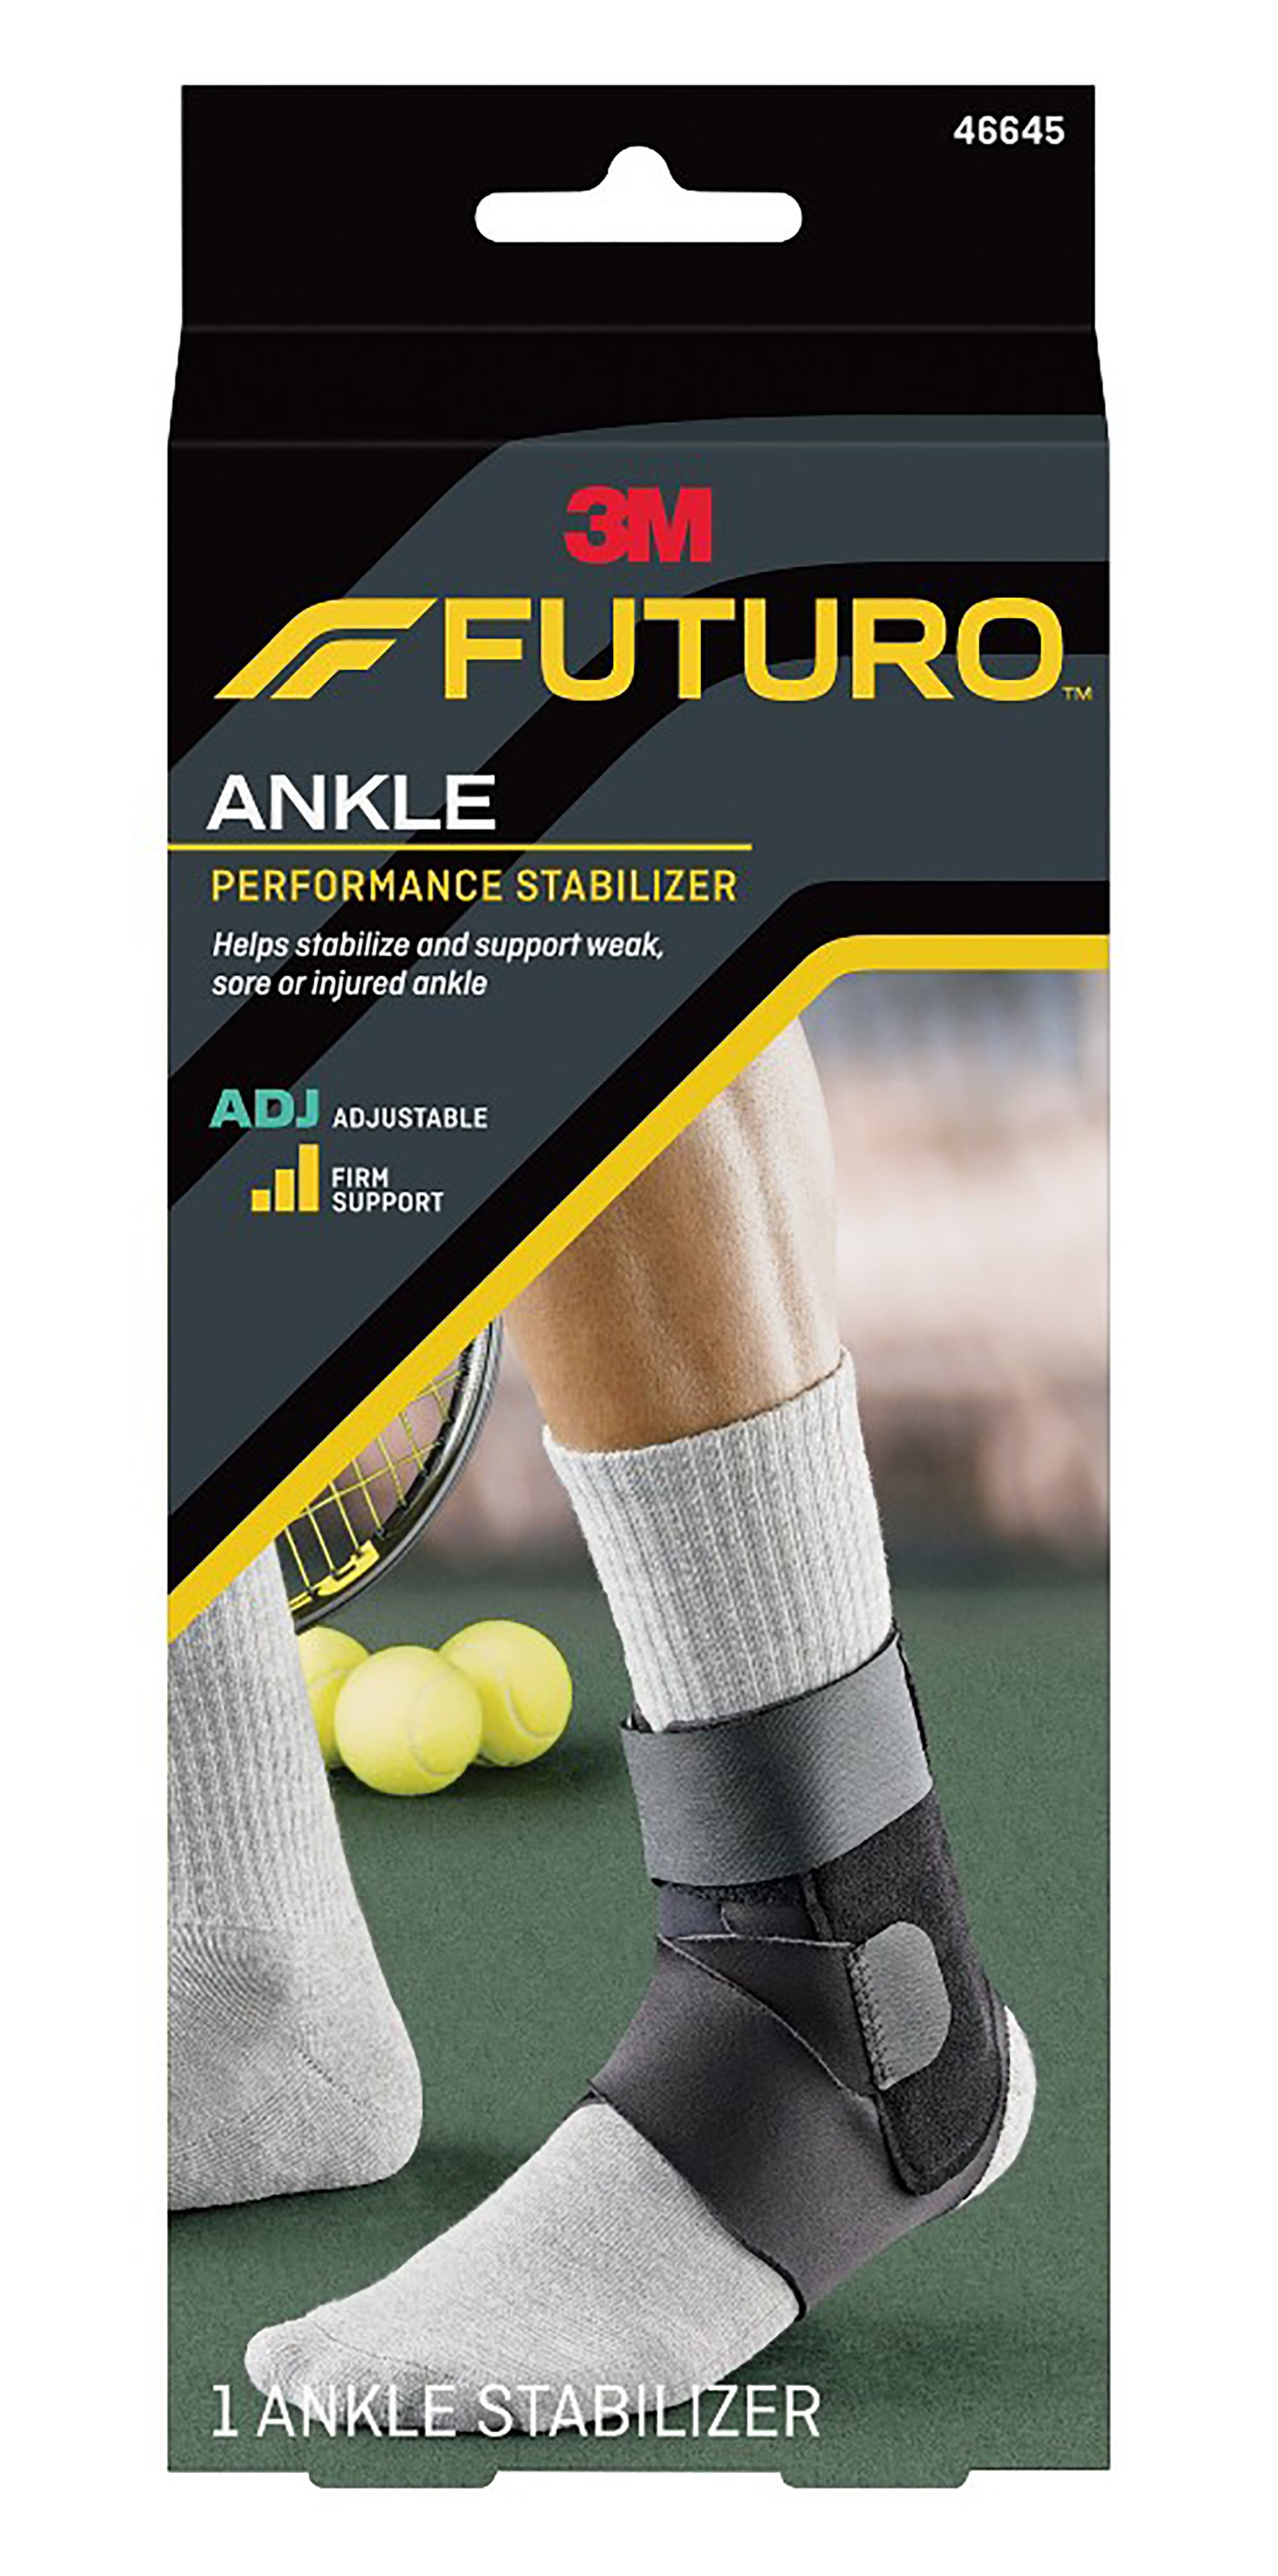 3M Futuro Ankle Performance Stabilizer, 46645ENR, Case of 12